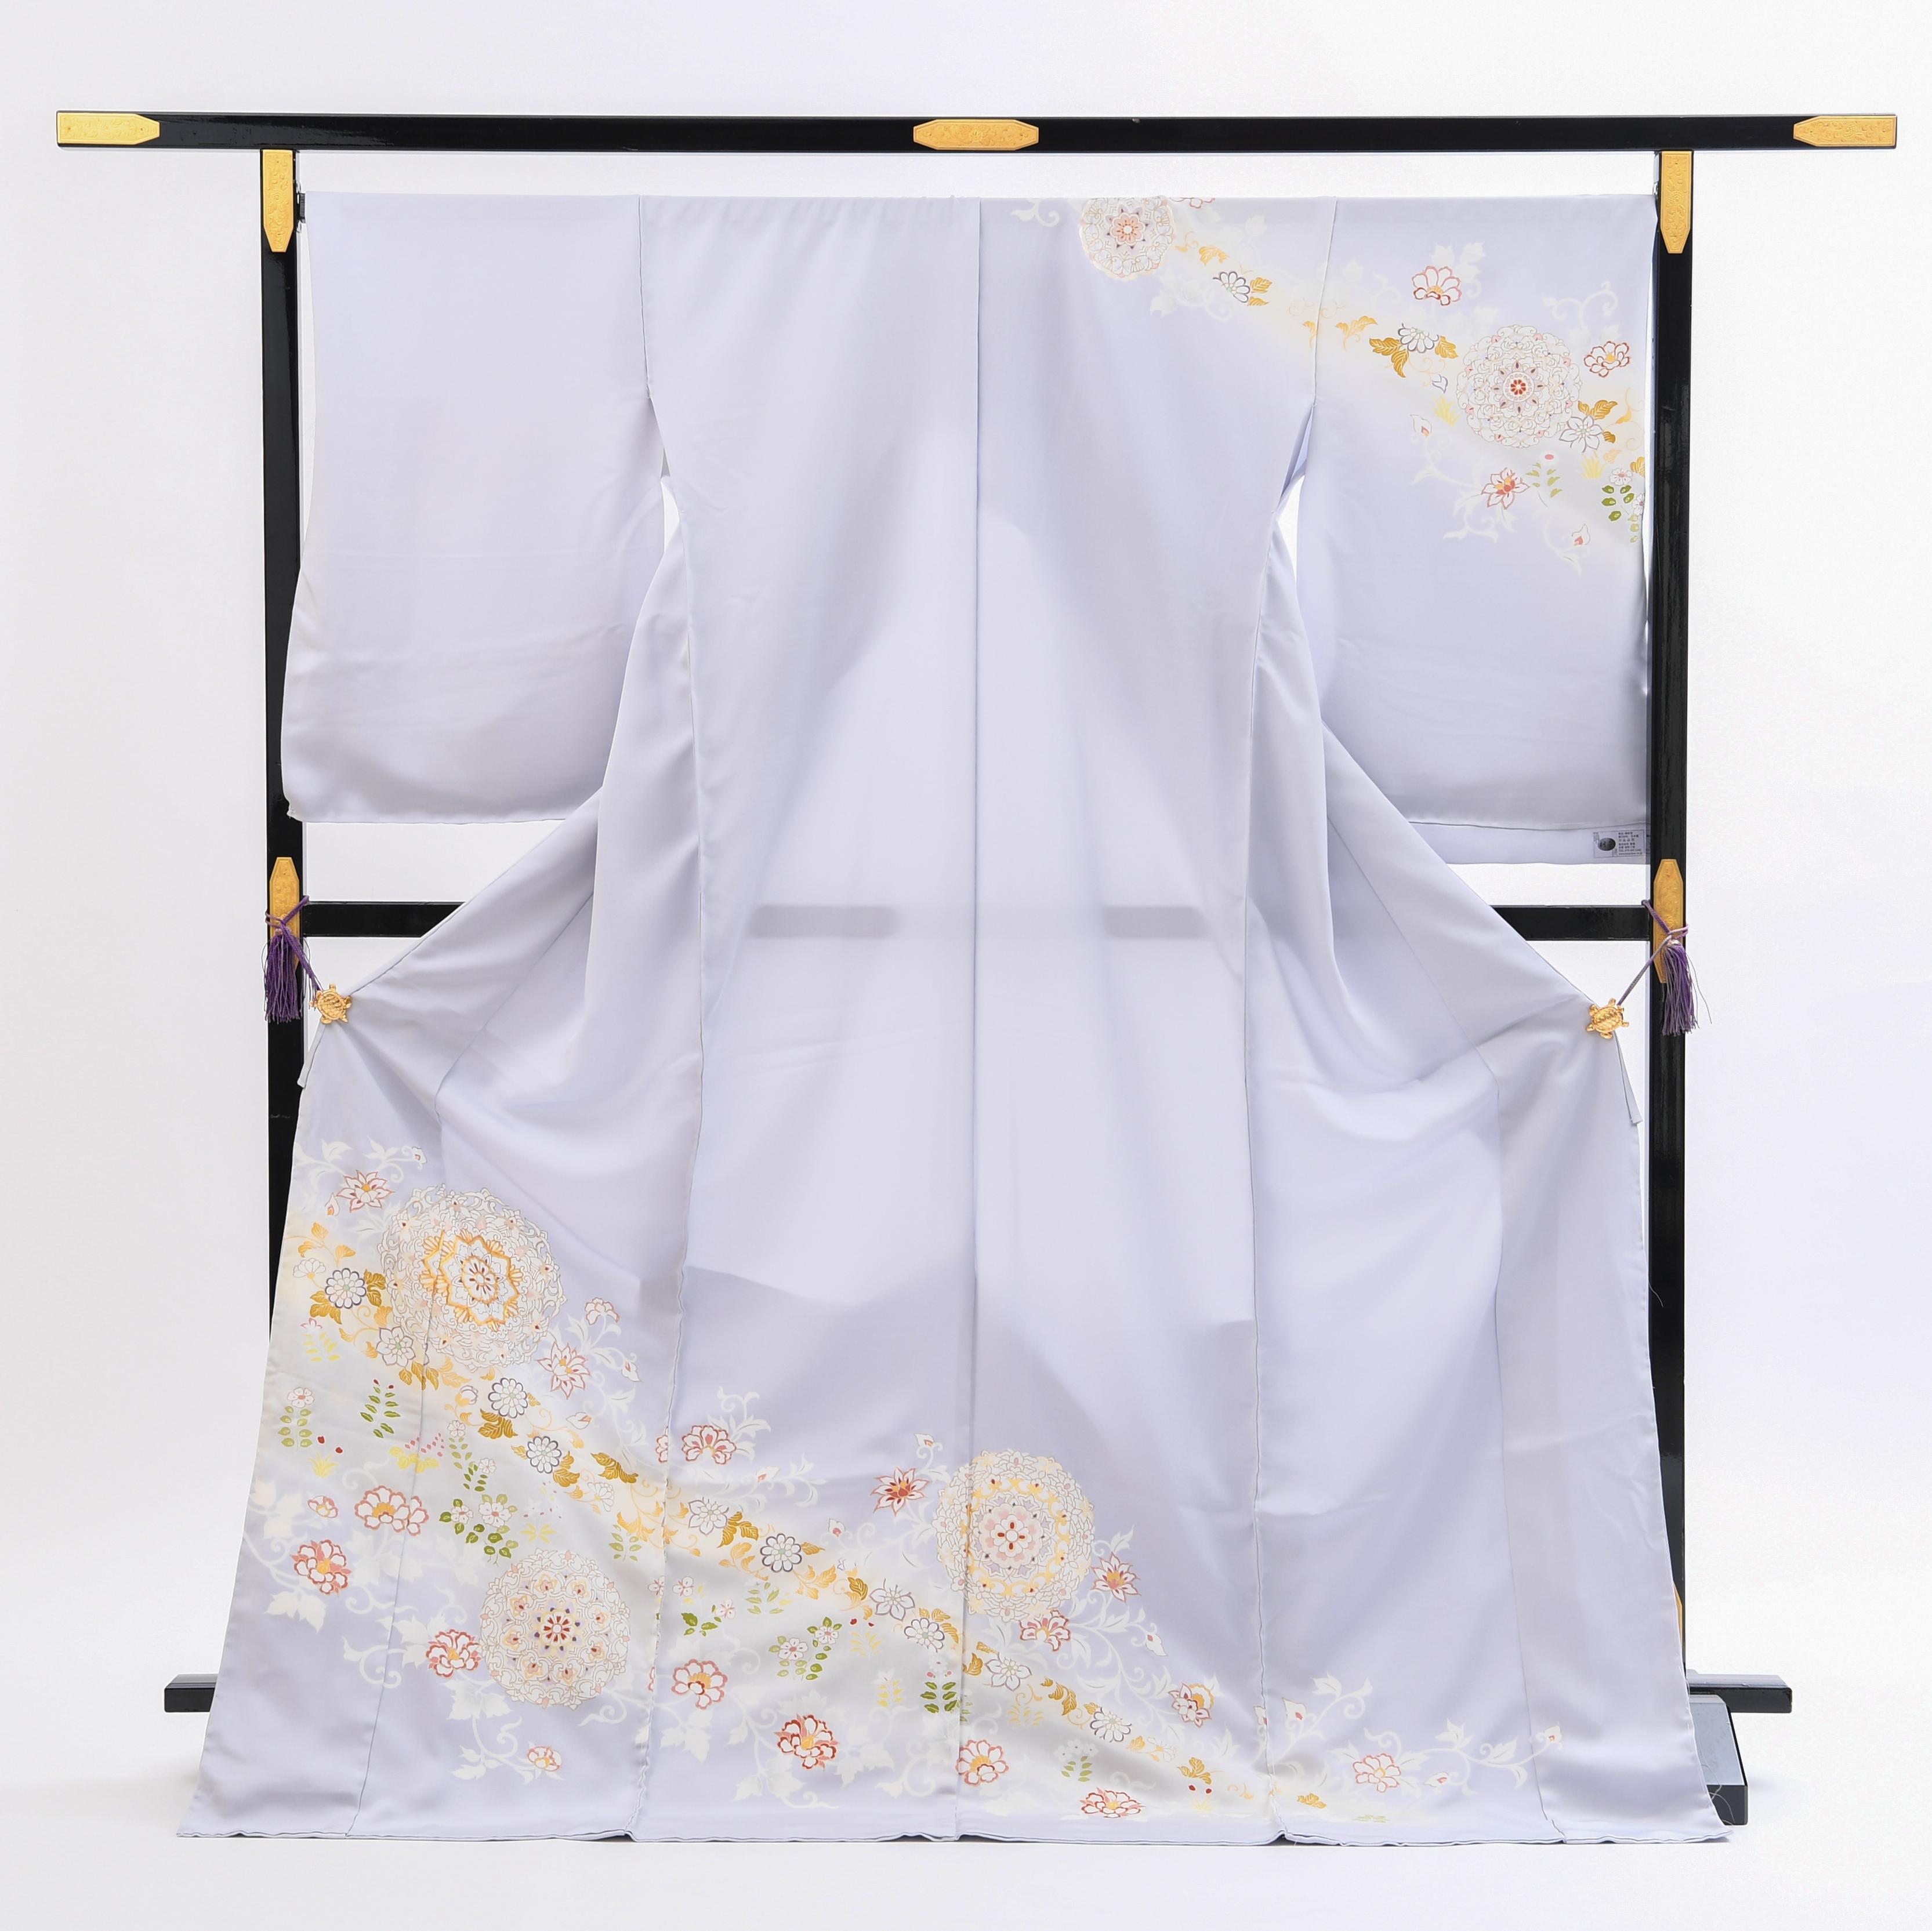 【高級訪問着レンタル】菱健謹製「淡い藤色系・正倉院文様」品番:h−452